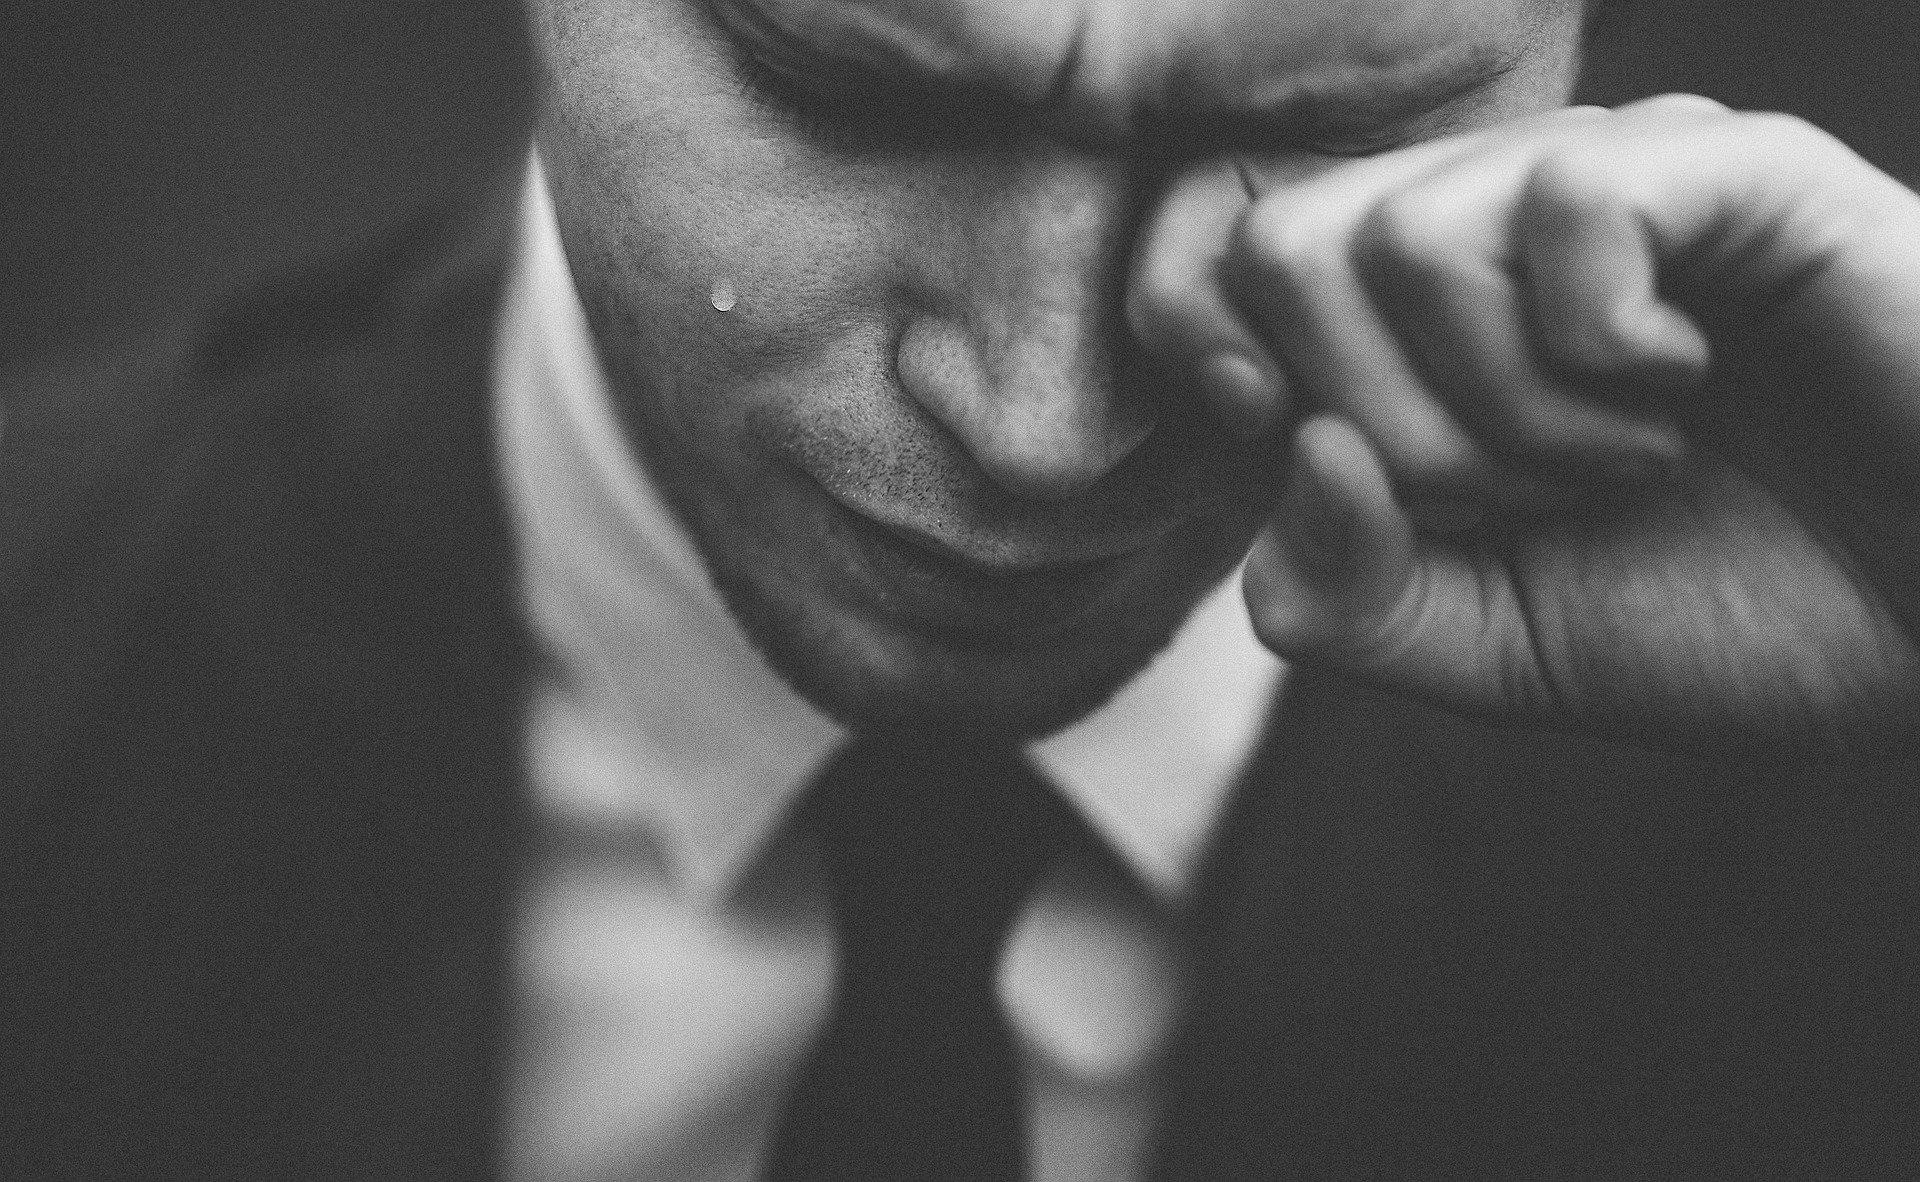 Mann weint